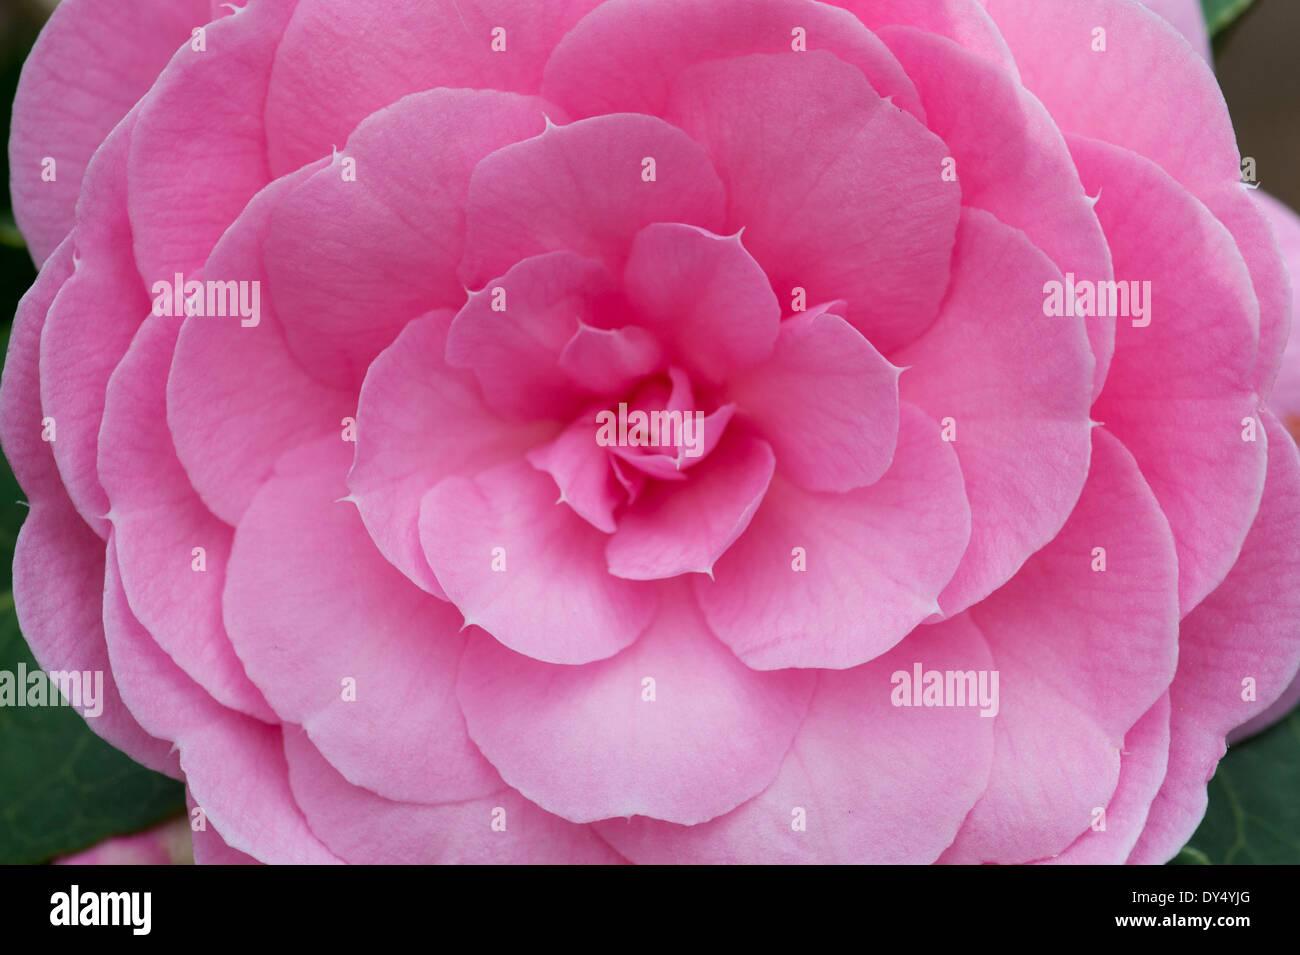 Camellia x Williamsii E.G Waterhouse flower - Stock Image